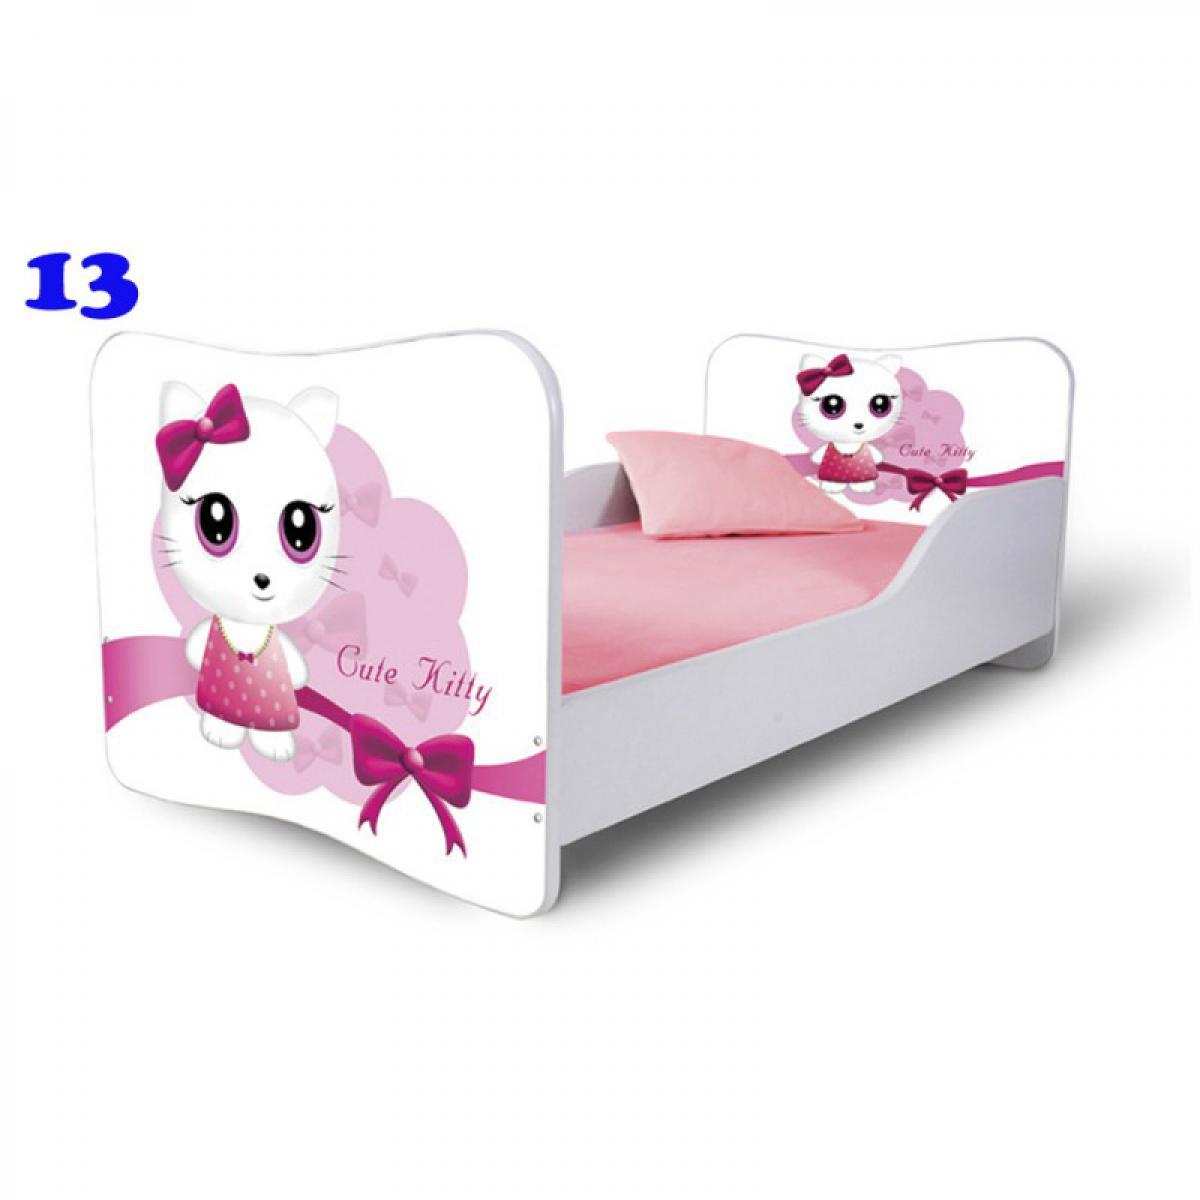 Bim Furniture Lit Enfant 180x80 cm Cute Kitty Blanc avec sommier et matelas